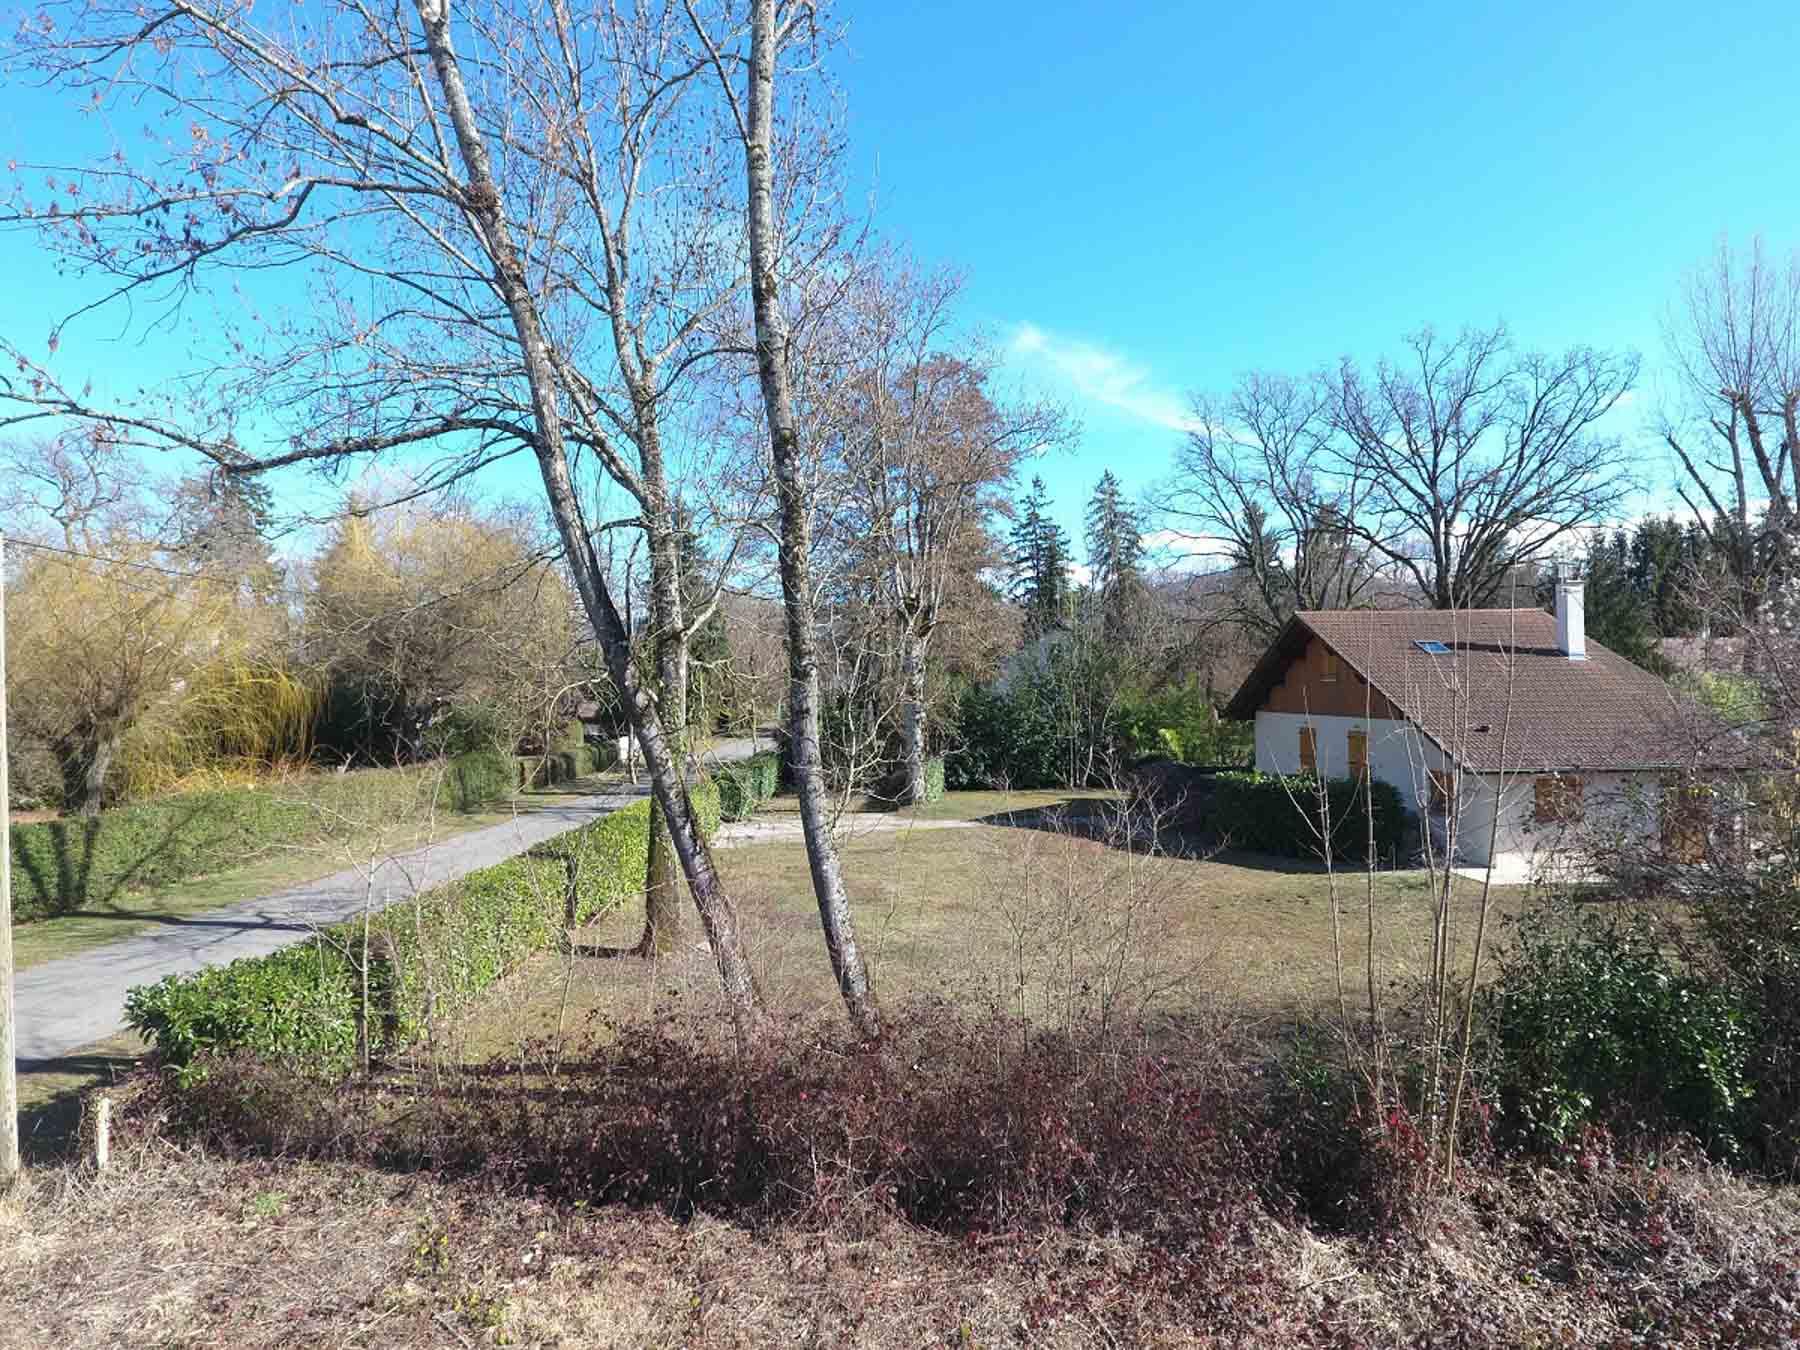 Domaine de coudree 282WJ neighbouring houses